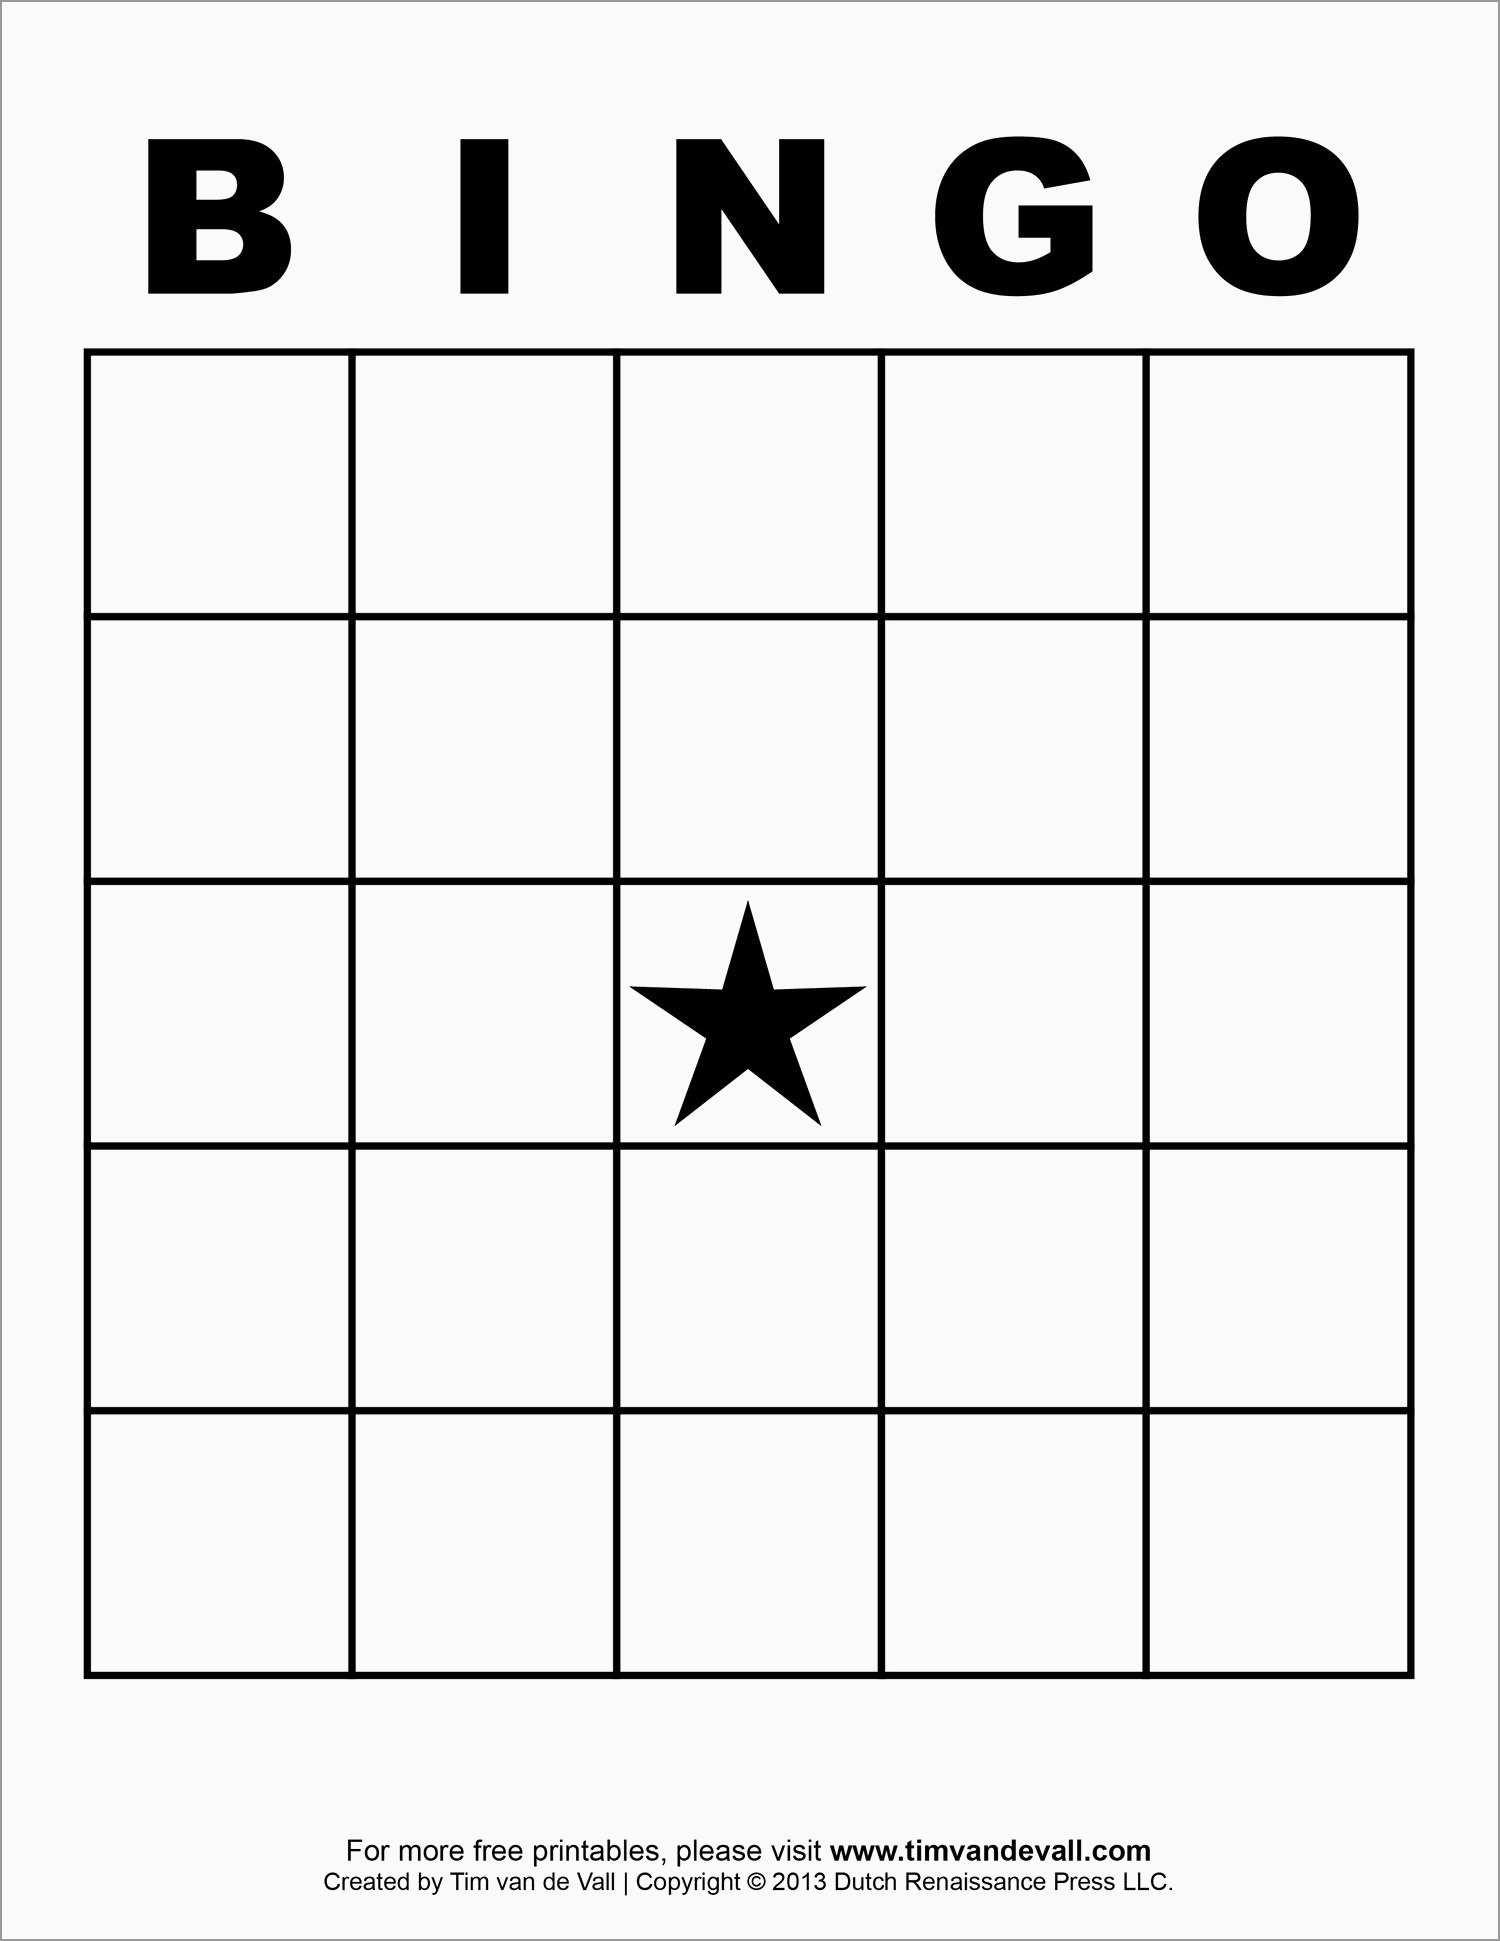 Luxury Bingo Card Template Free | Best Of Template - Bingo Generator Free Printable